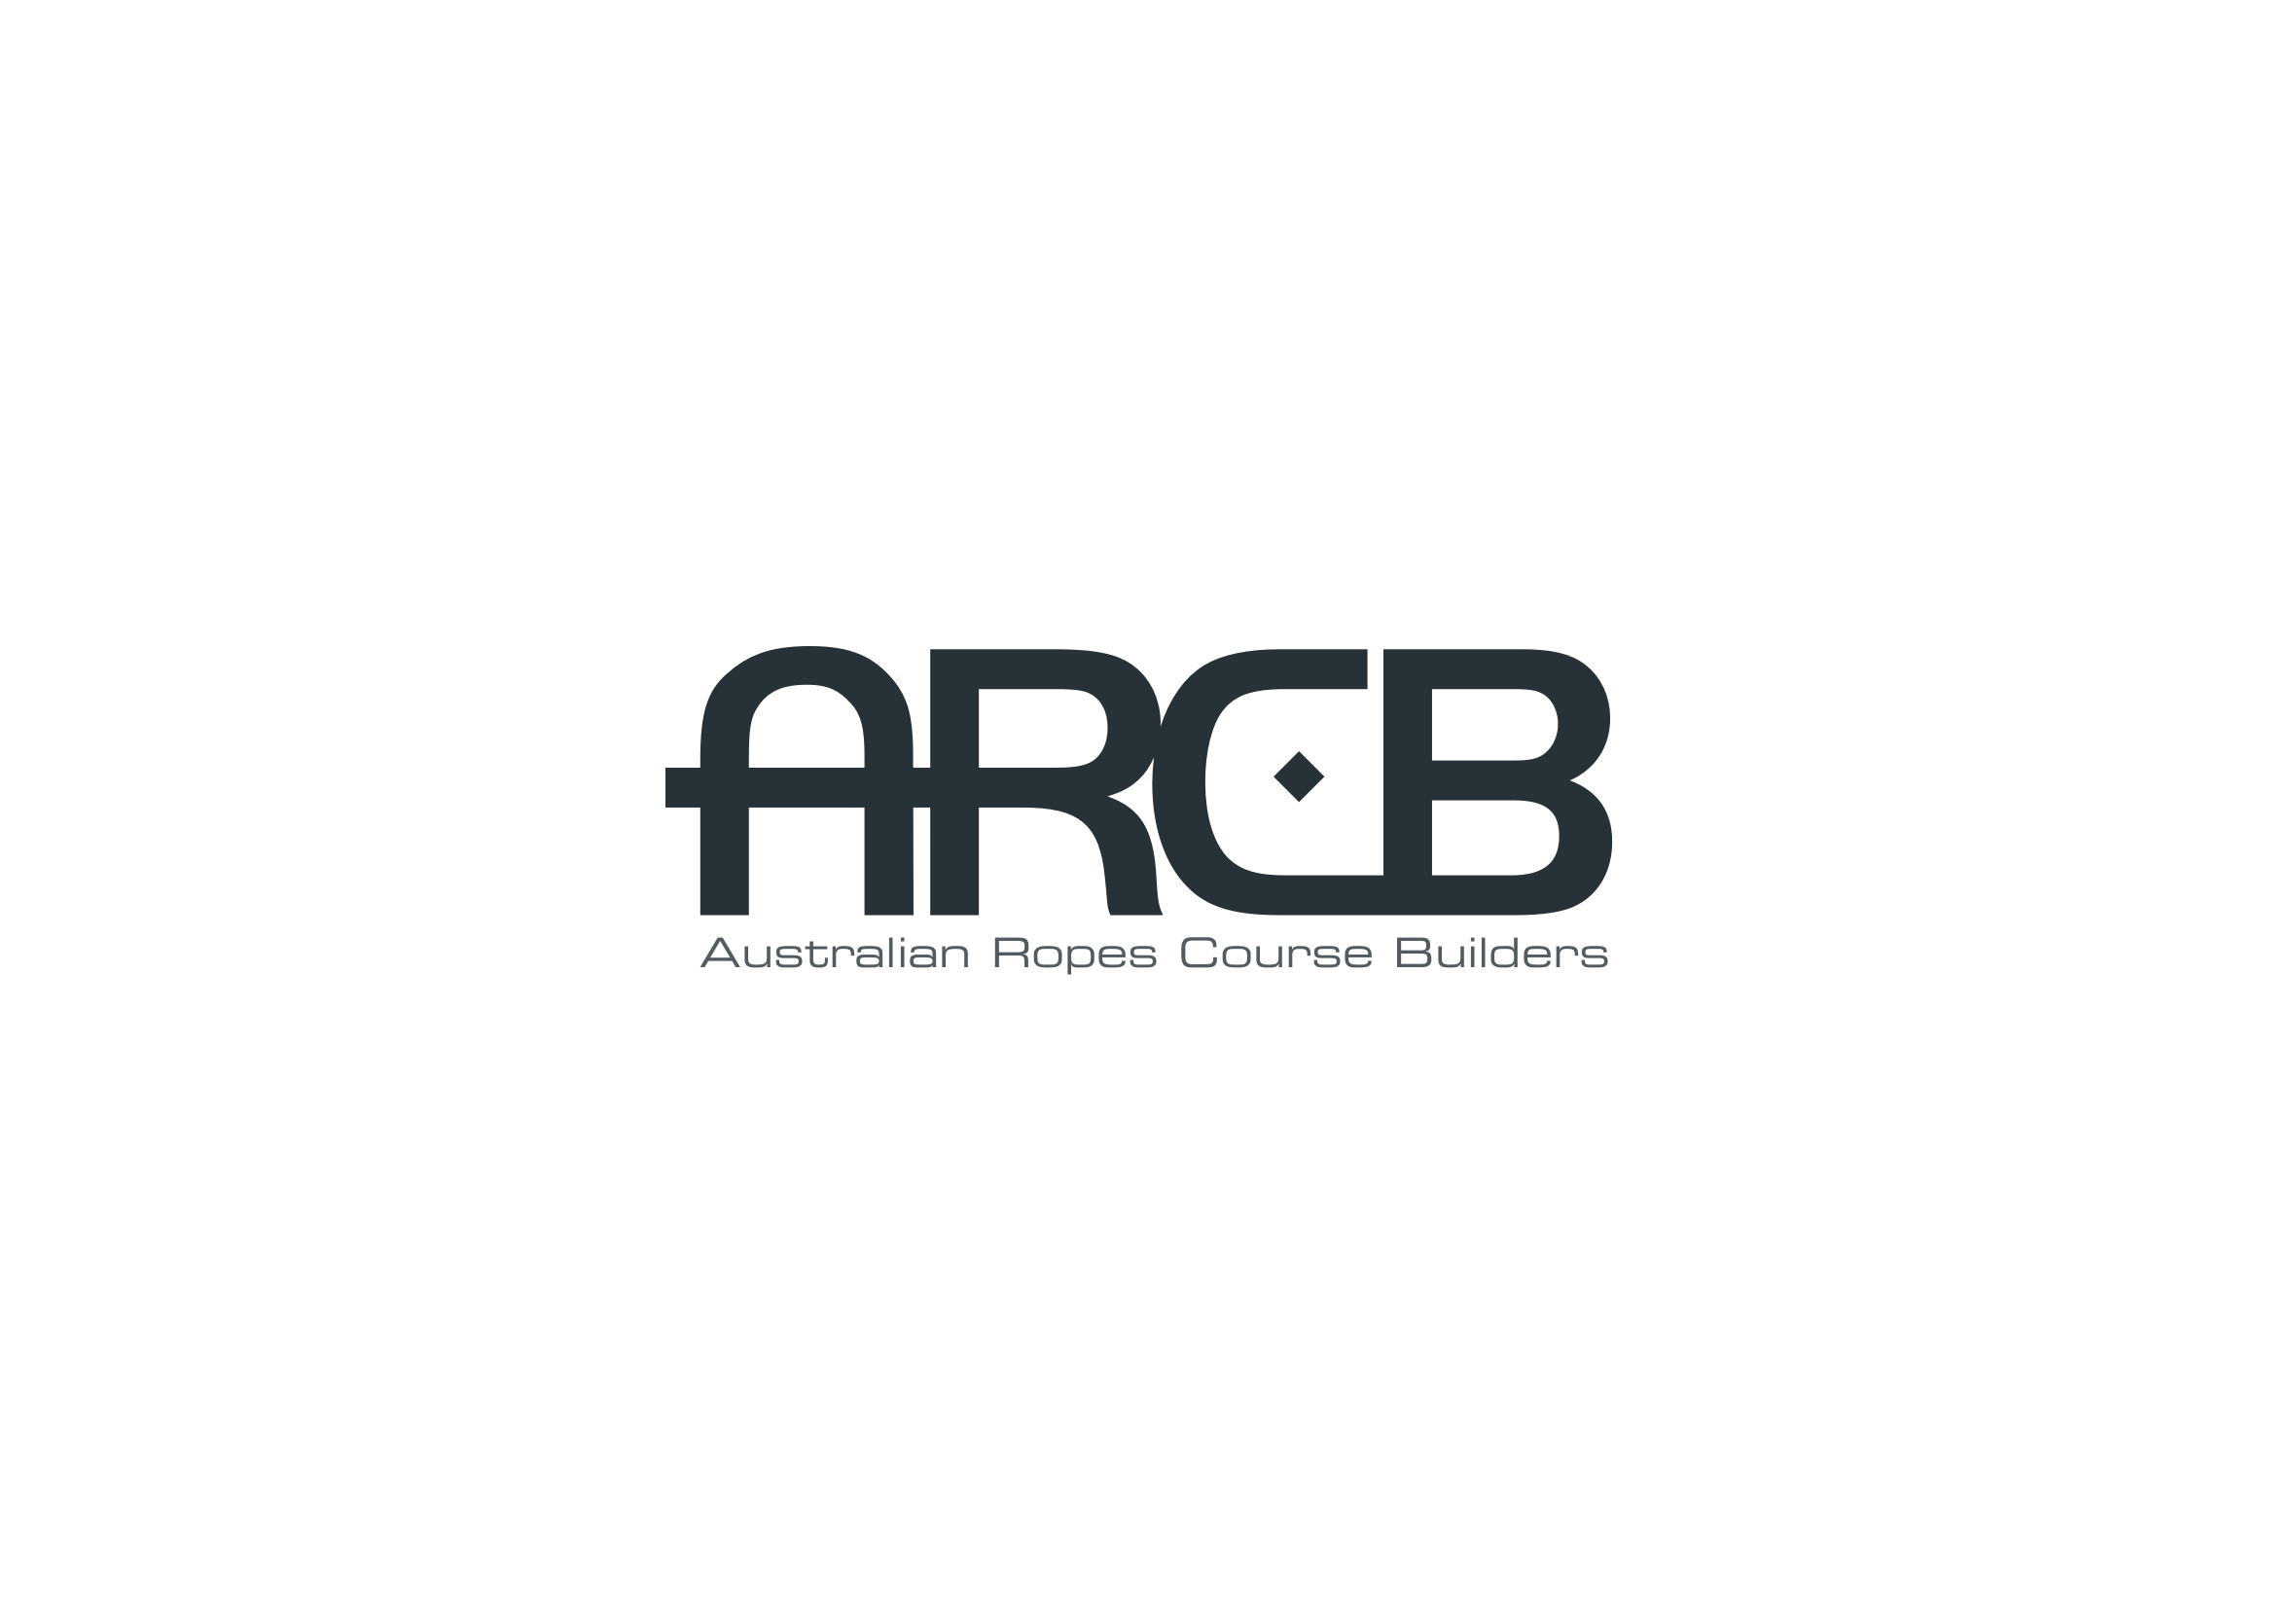 Australian Ropes Course Builders (ARCB) logo - light version